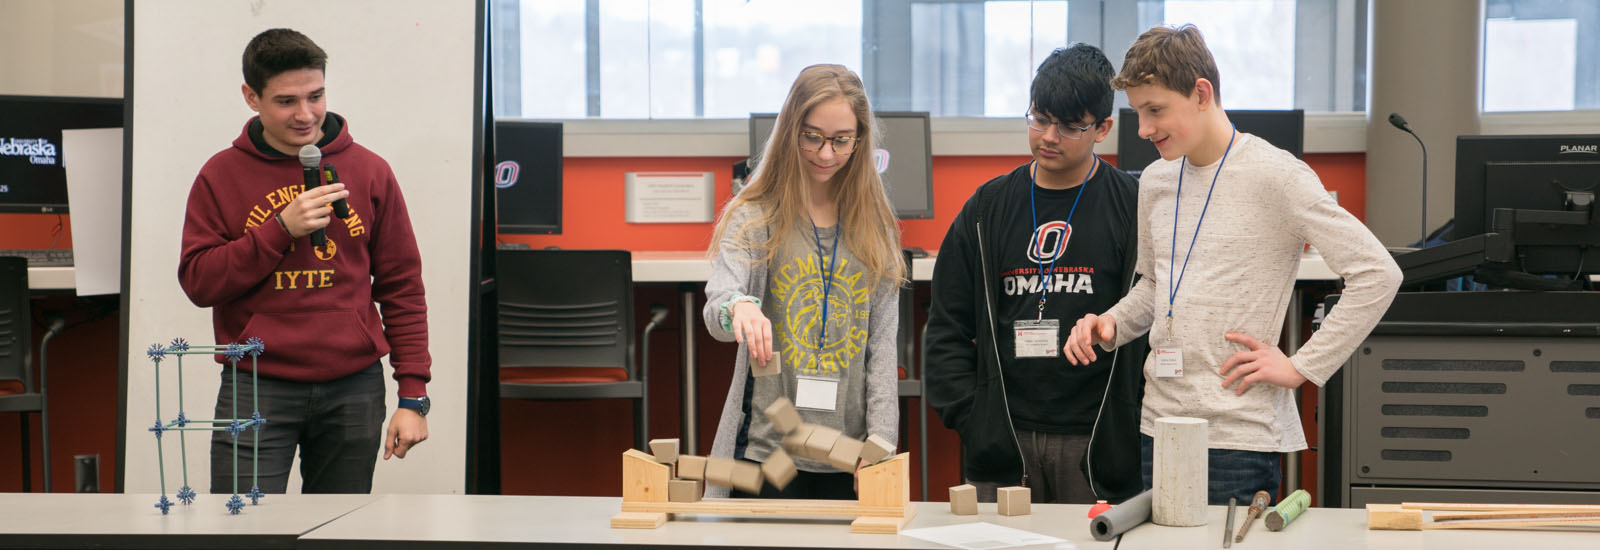 Durham School Outreach Programs